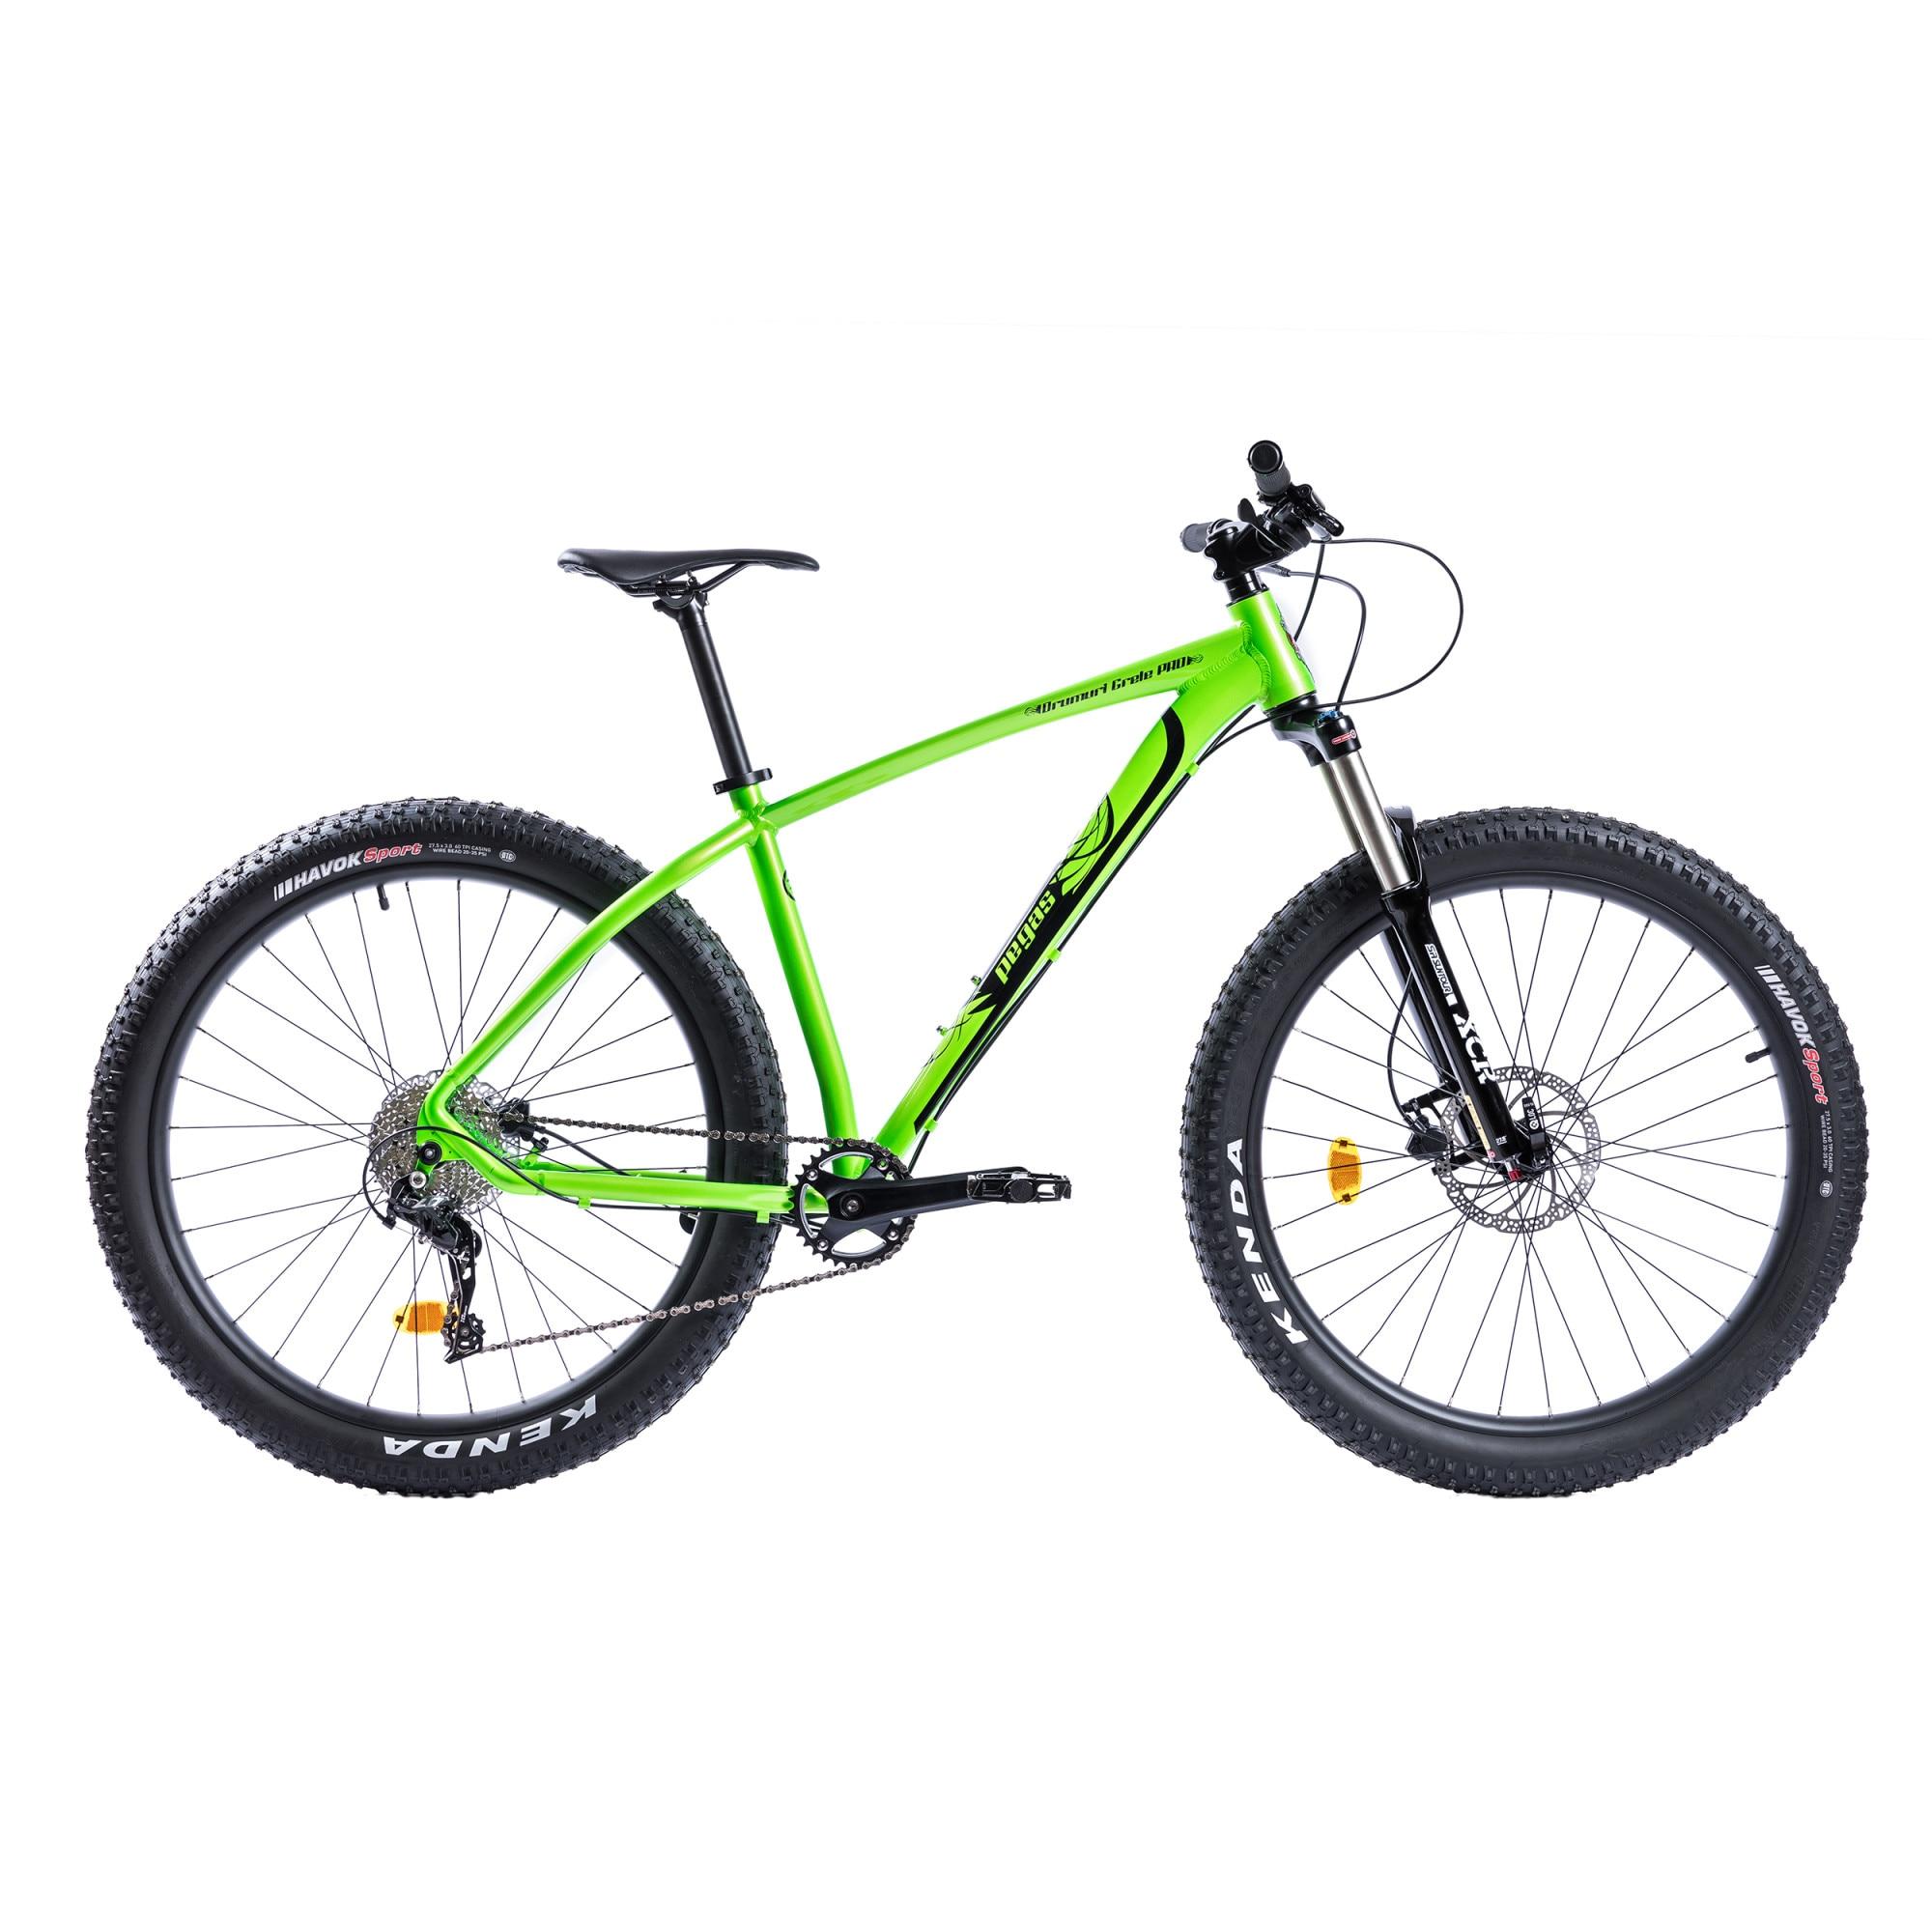 "Fotografie Bicicleta Pegas MTB Fat Bike Drumuri Grele Pro 18.5"", Verde/Negru"